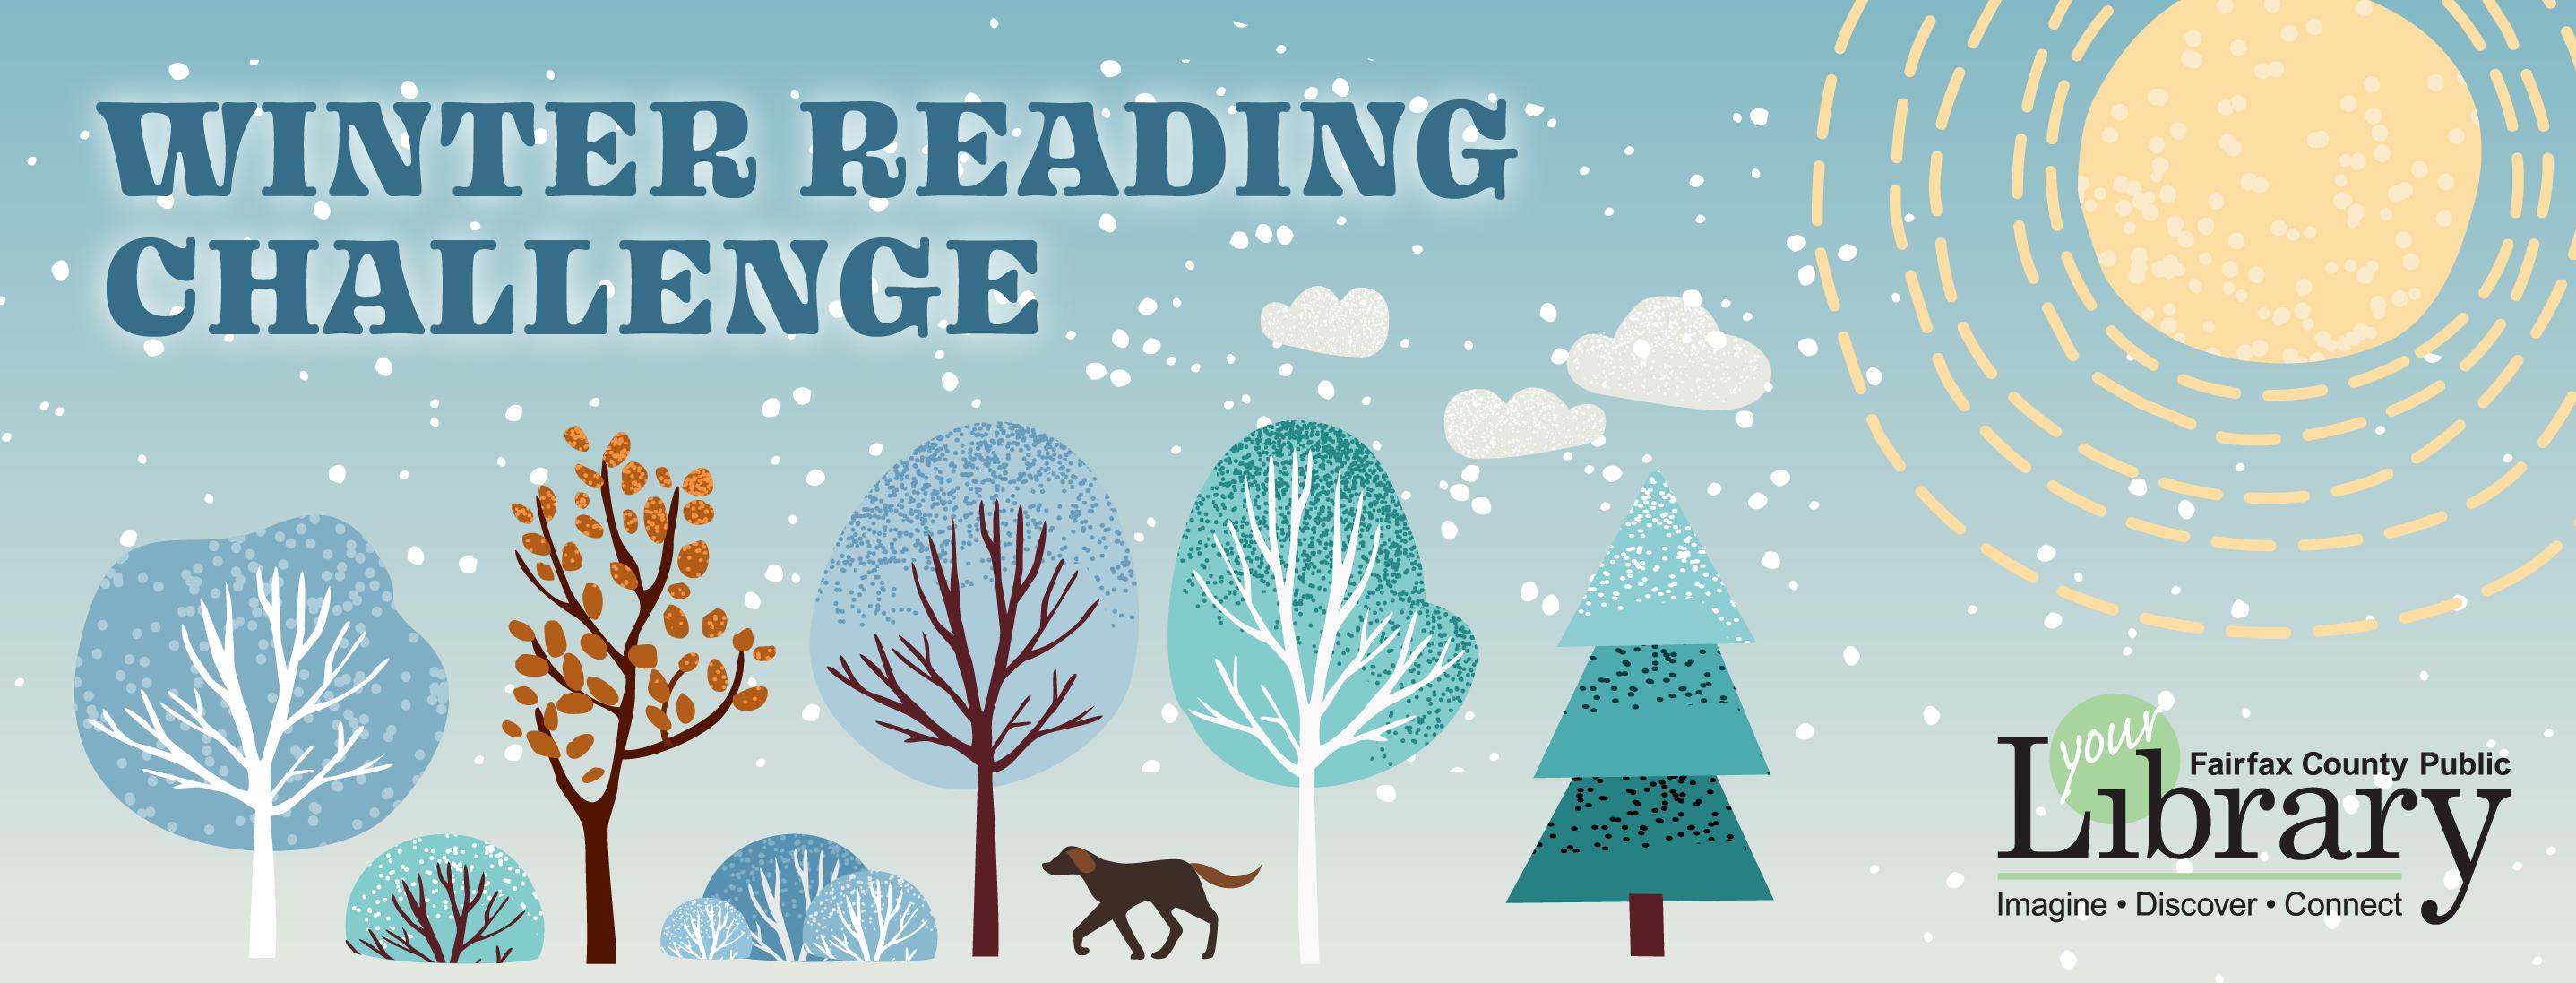 winter reading challenge 2021 banner image